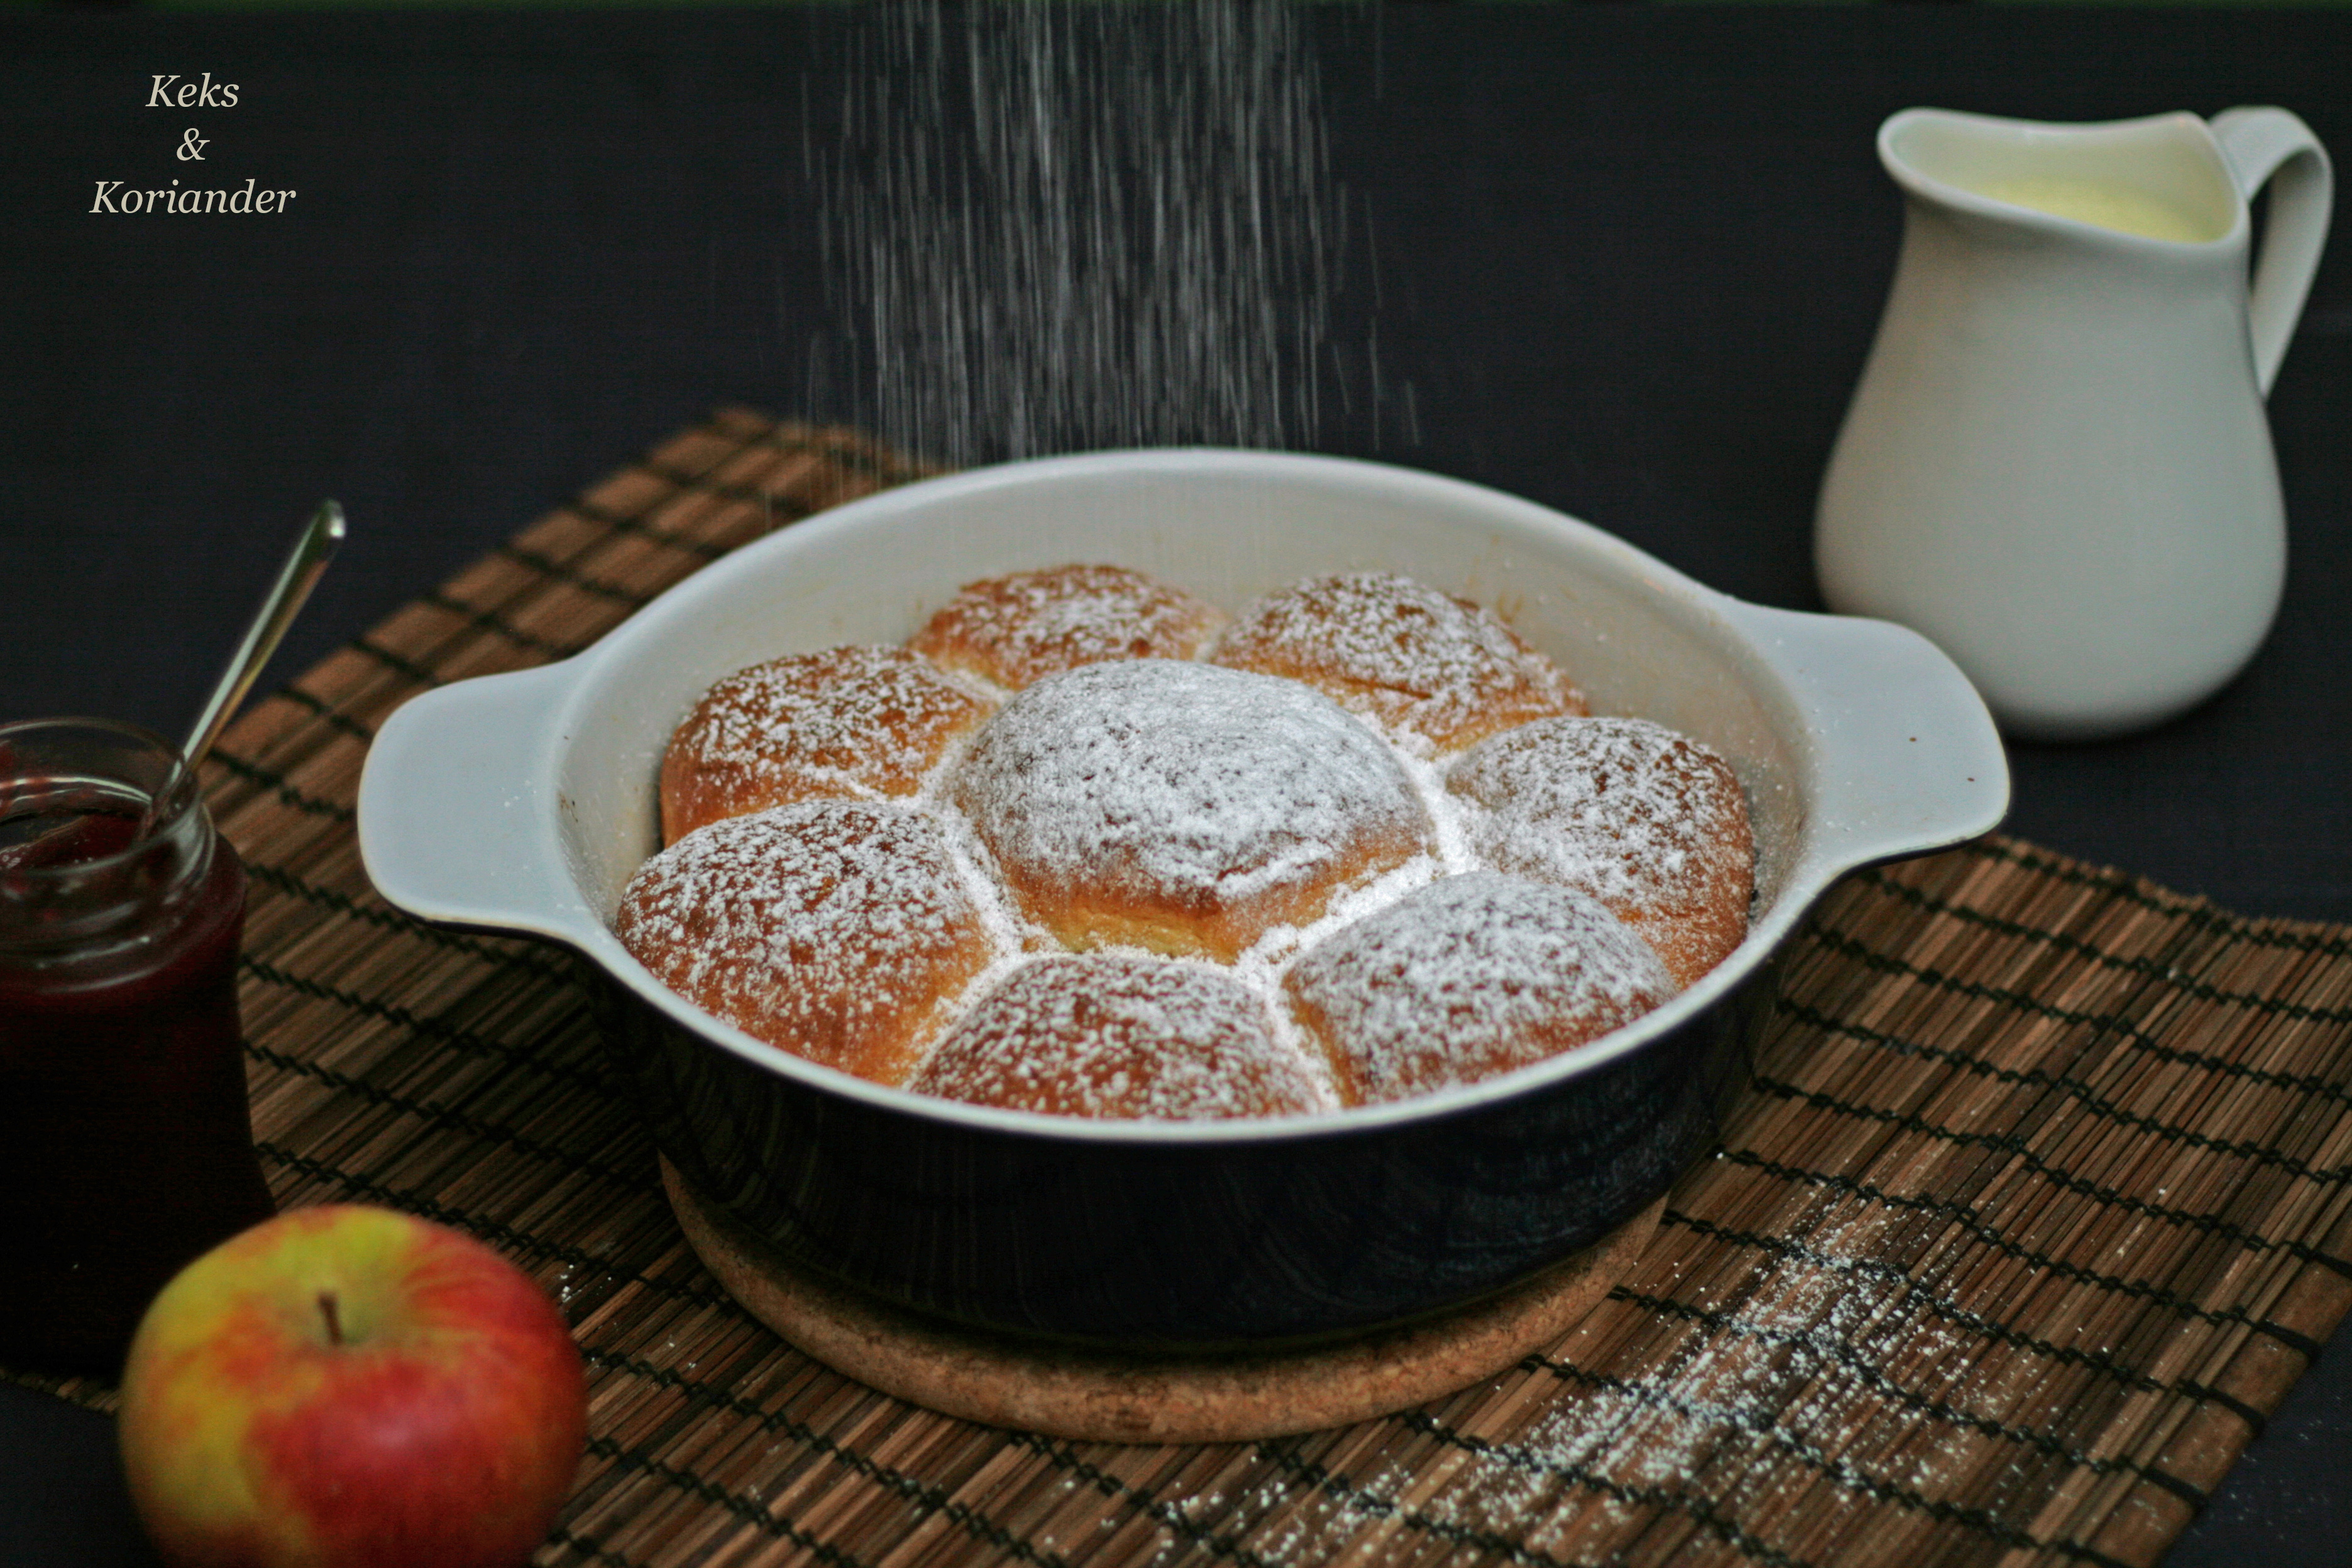 Buchteln Apfelfüllung Johannisbeer Vanillesoße